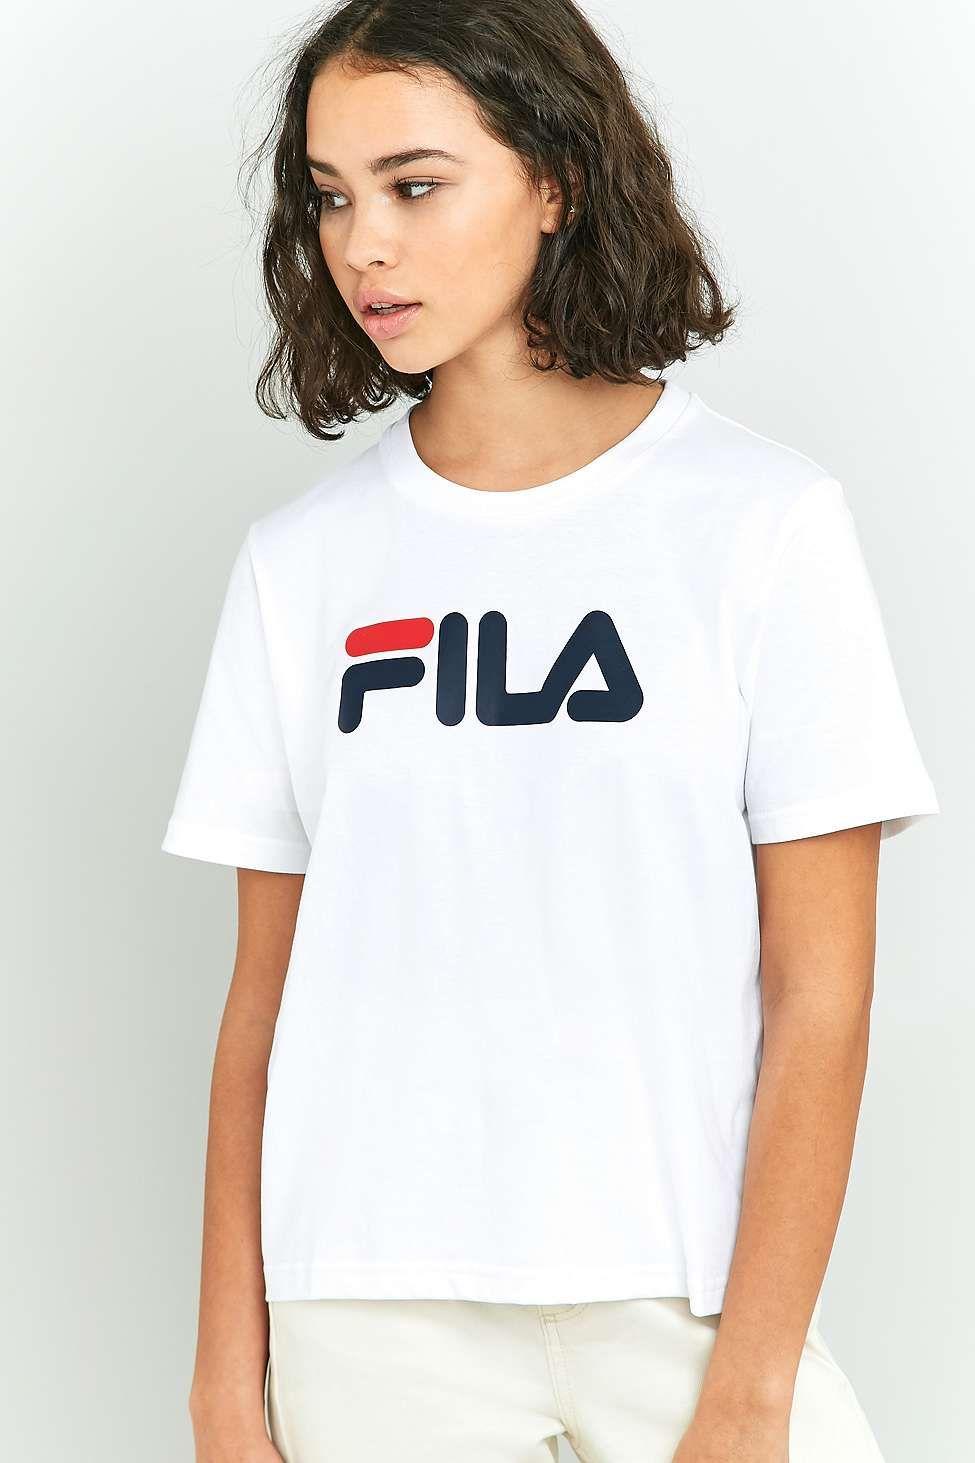 579ba3ddcc FILA White Eagle T-shirt | Alibi | Eagle shirts, T shirt, T shirts ...